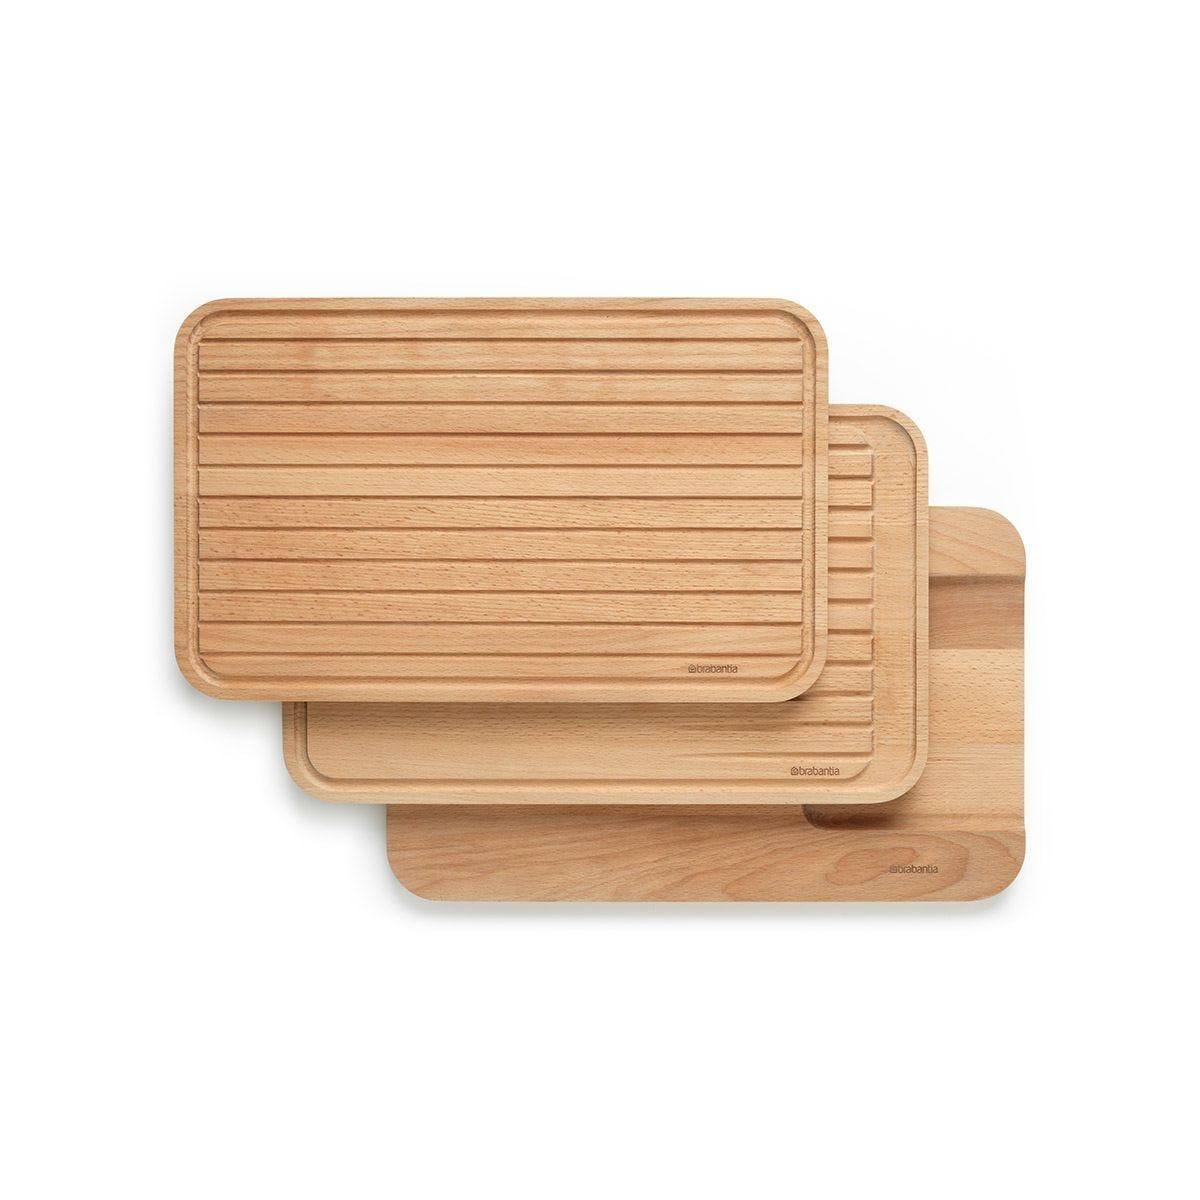 Brabantia Wooden Chopping Board Set of 3 - Profile